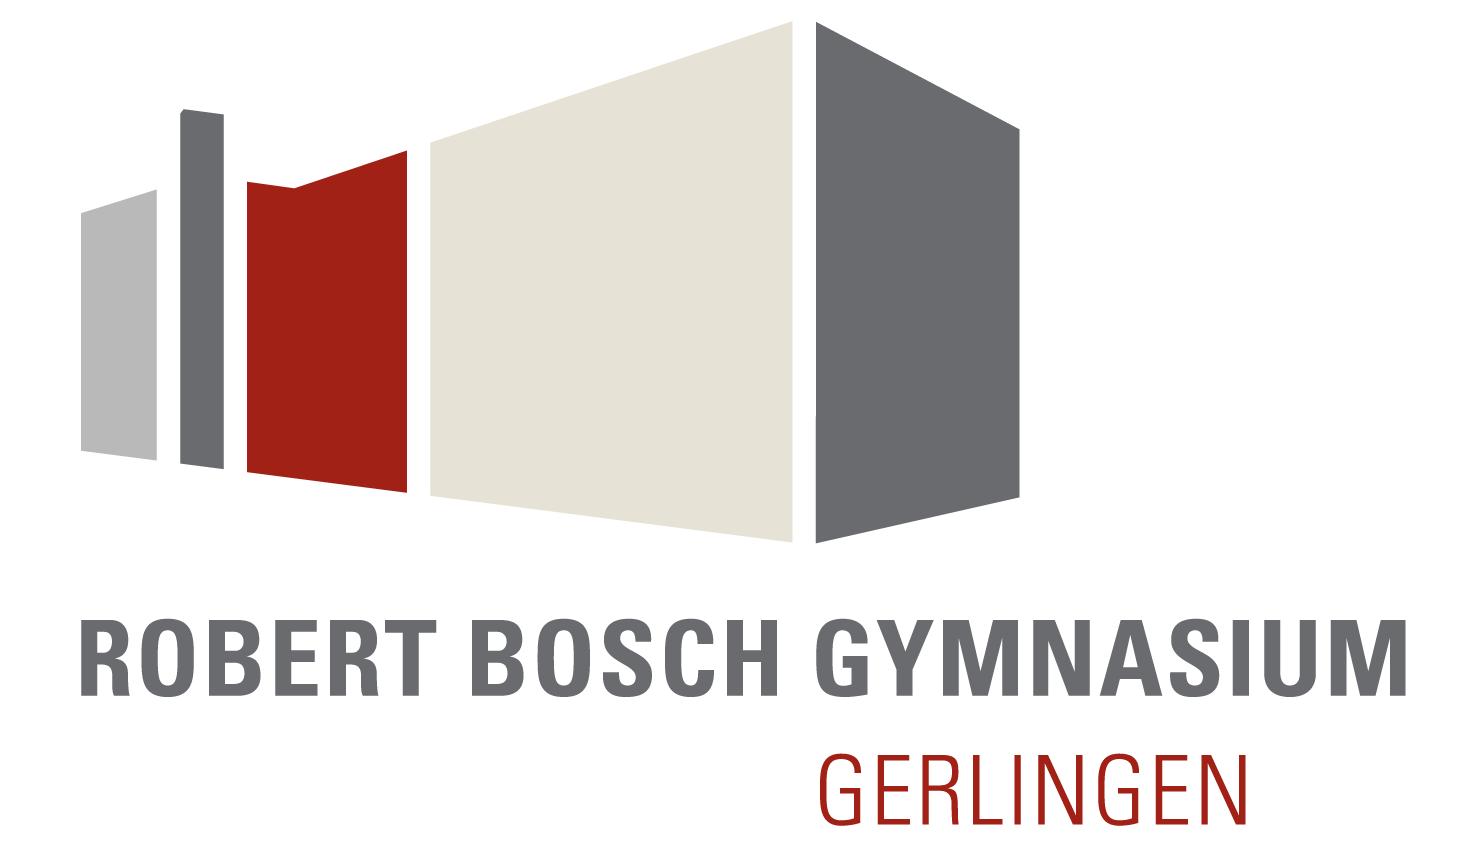 Robert Bosch Gymnasium – Gerlingen